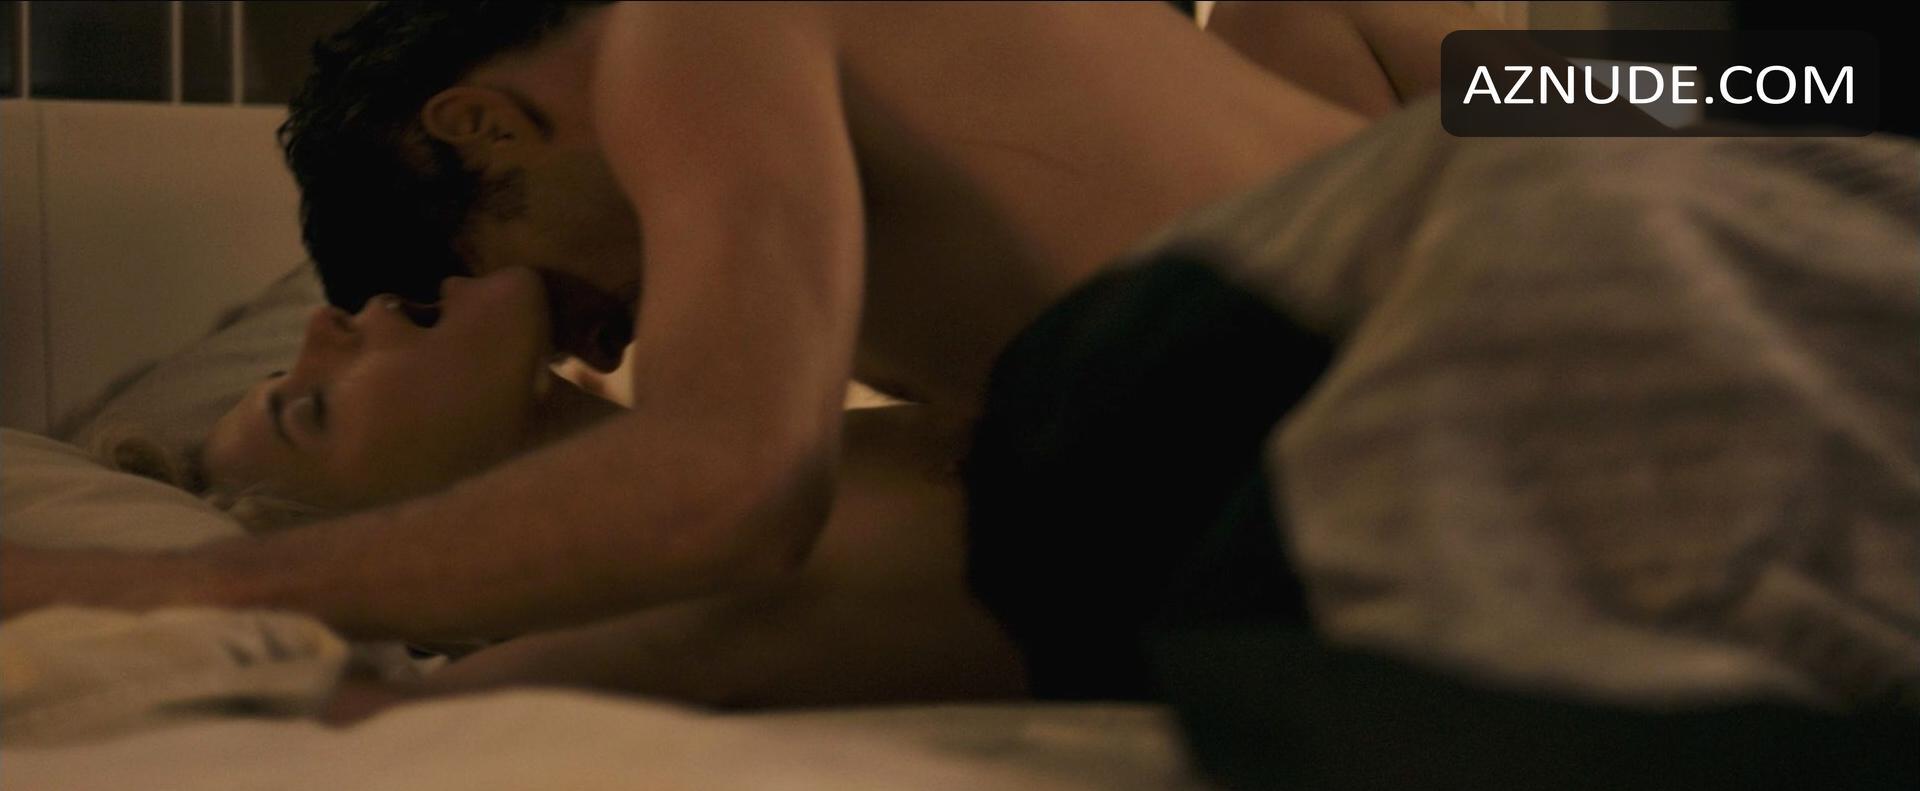 The loft sex scene